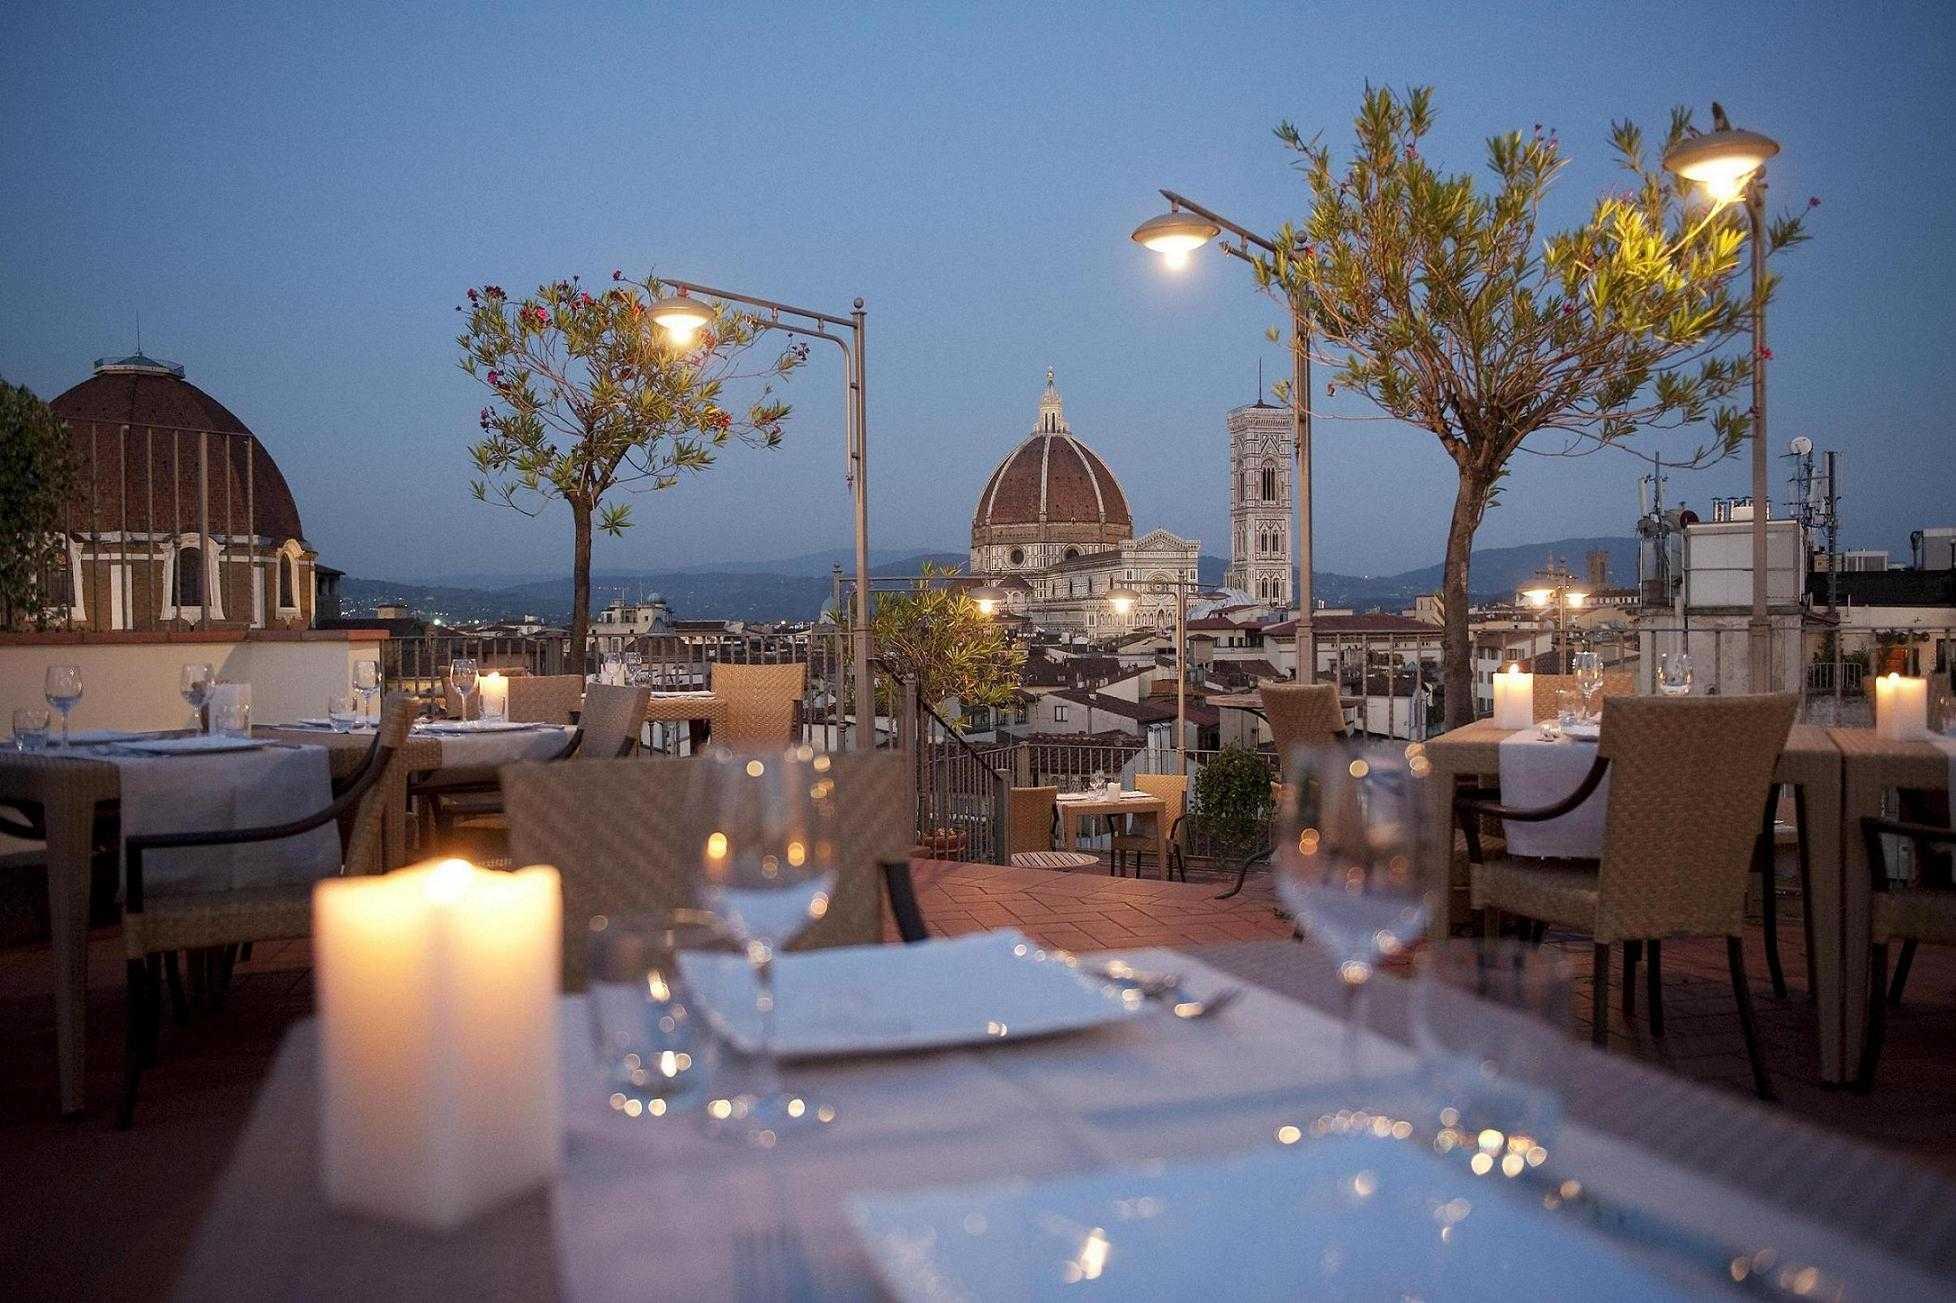 Terrazza Brunelleschi Panoramic Restaurant & Roof Garden - Firenze ...